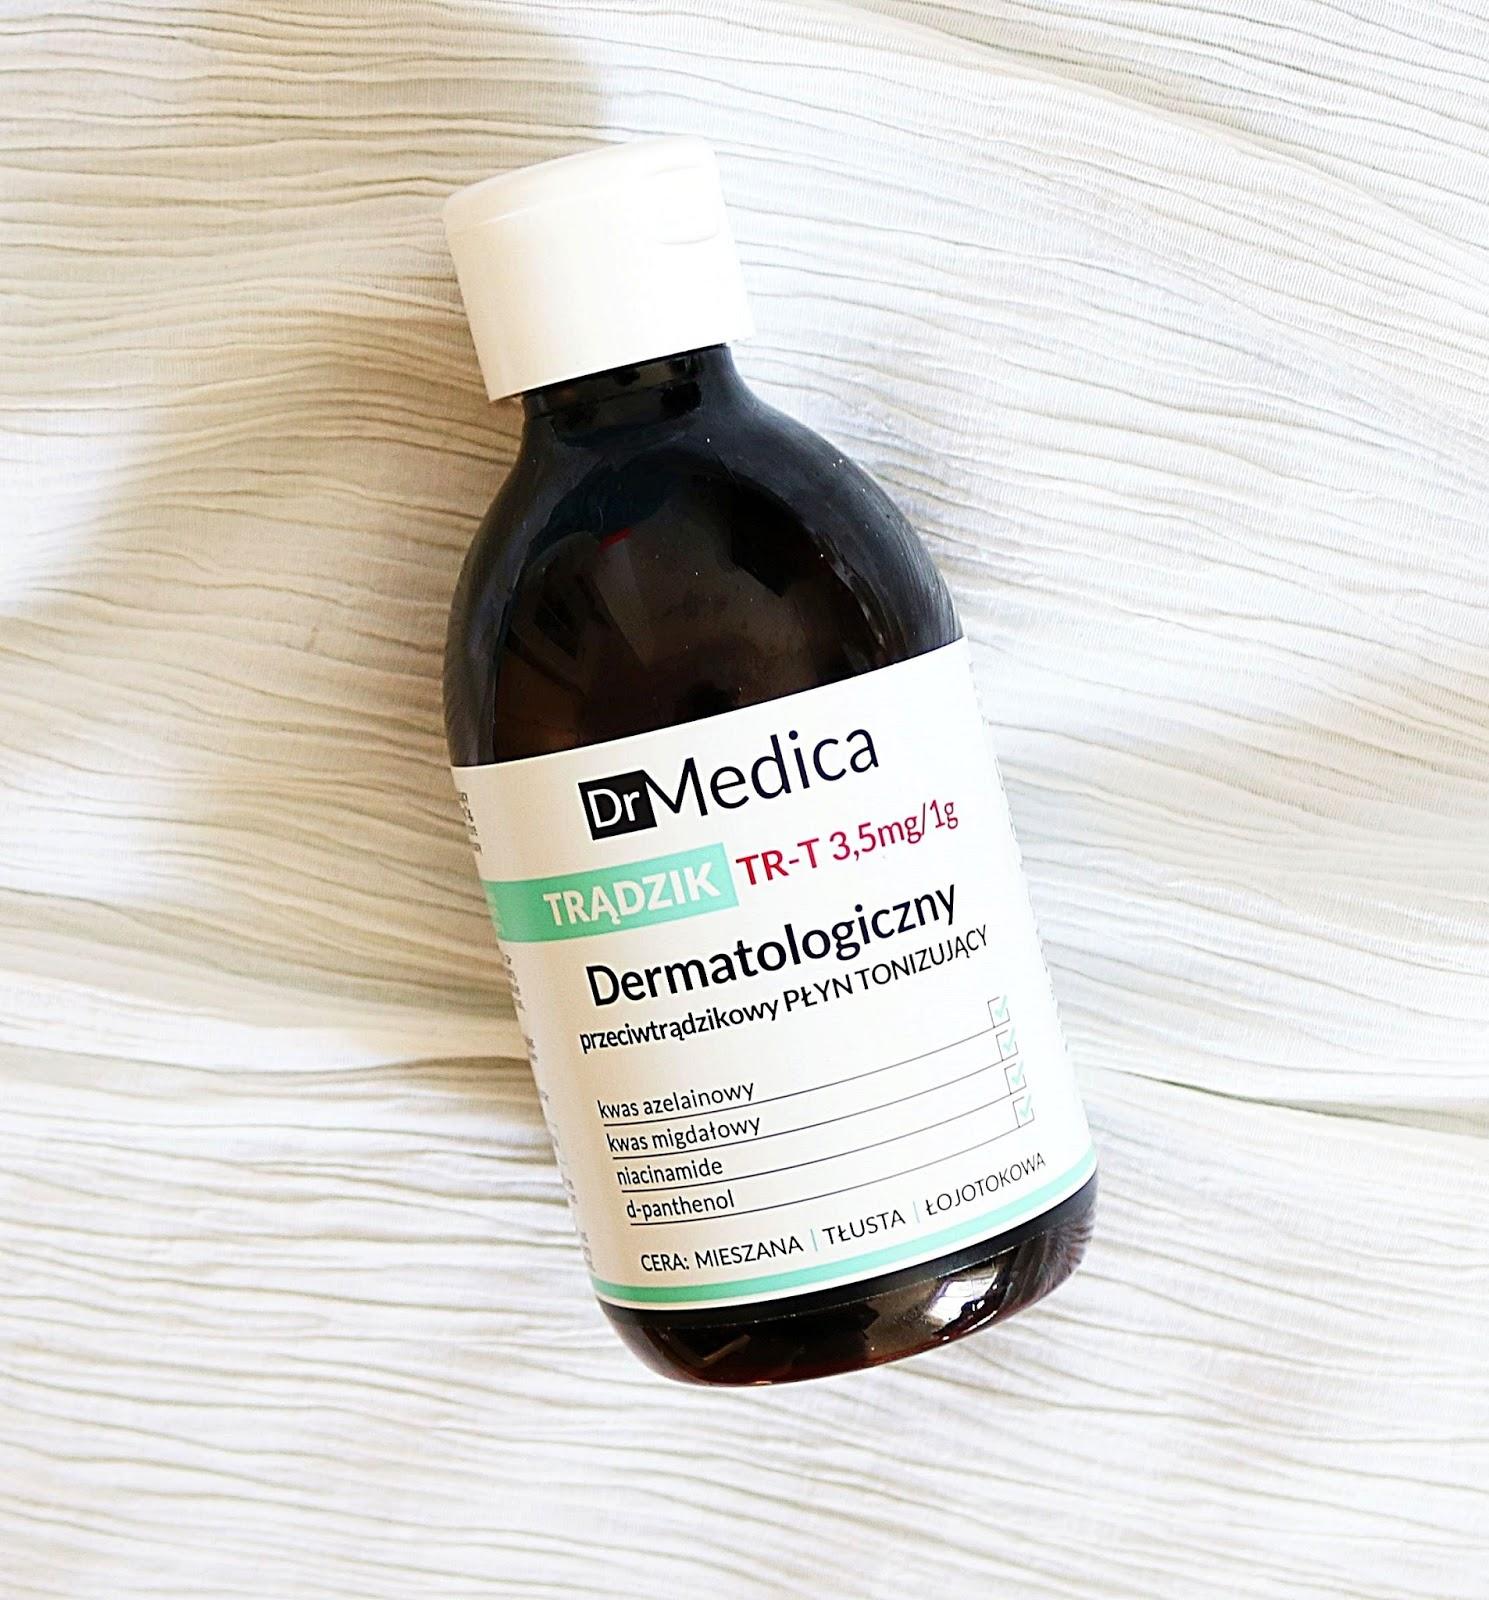 Nowości kosmetyczne | Clinique, Sampar, I Want, Dr Medica, Vis Plantis, Pilomax